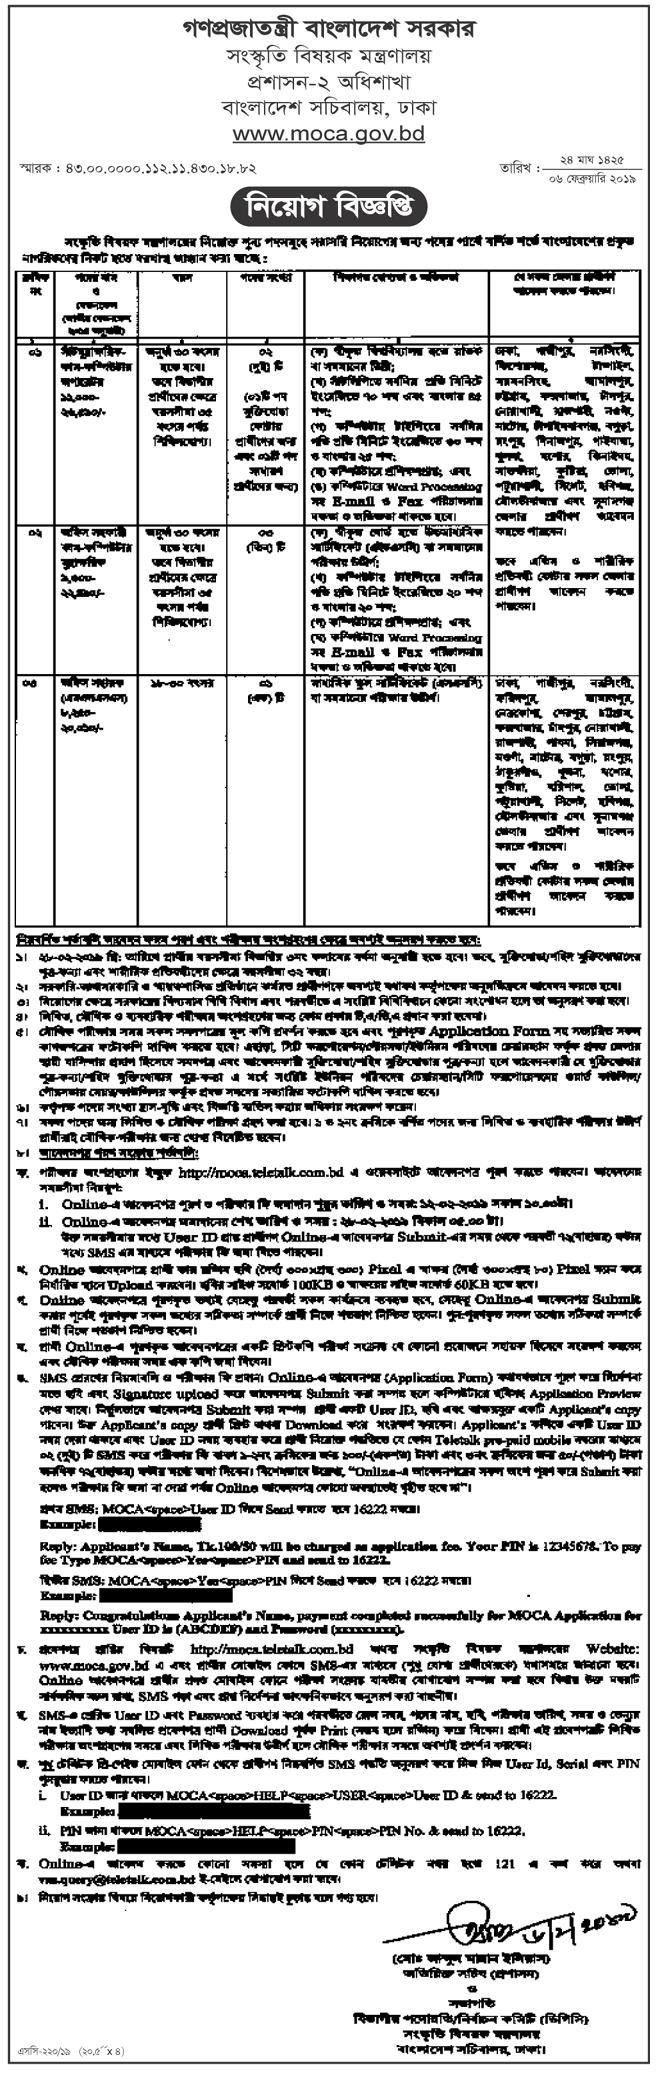 Ministry of Cultural Affairs Job Circular 2019